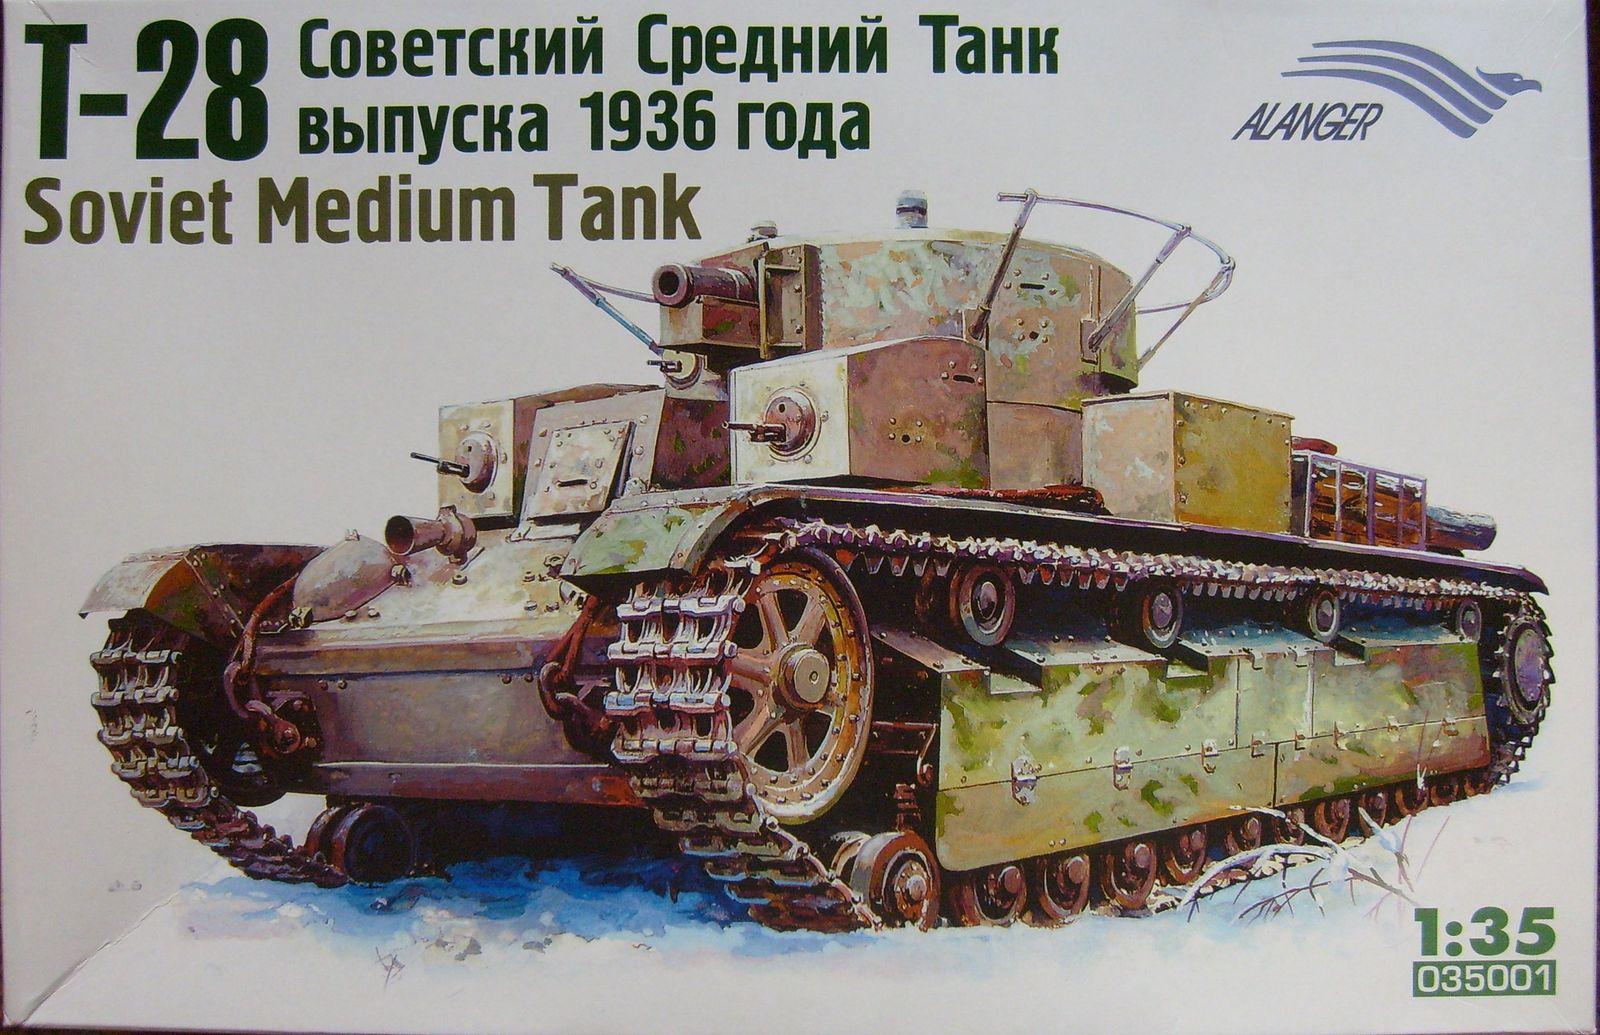 035001 T-28 Model 1936 Image